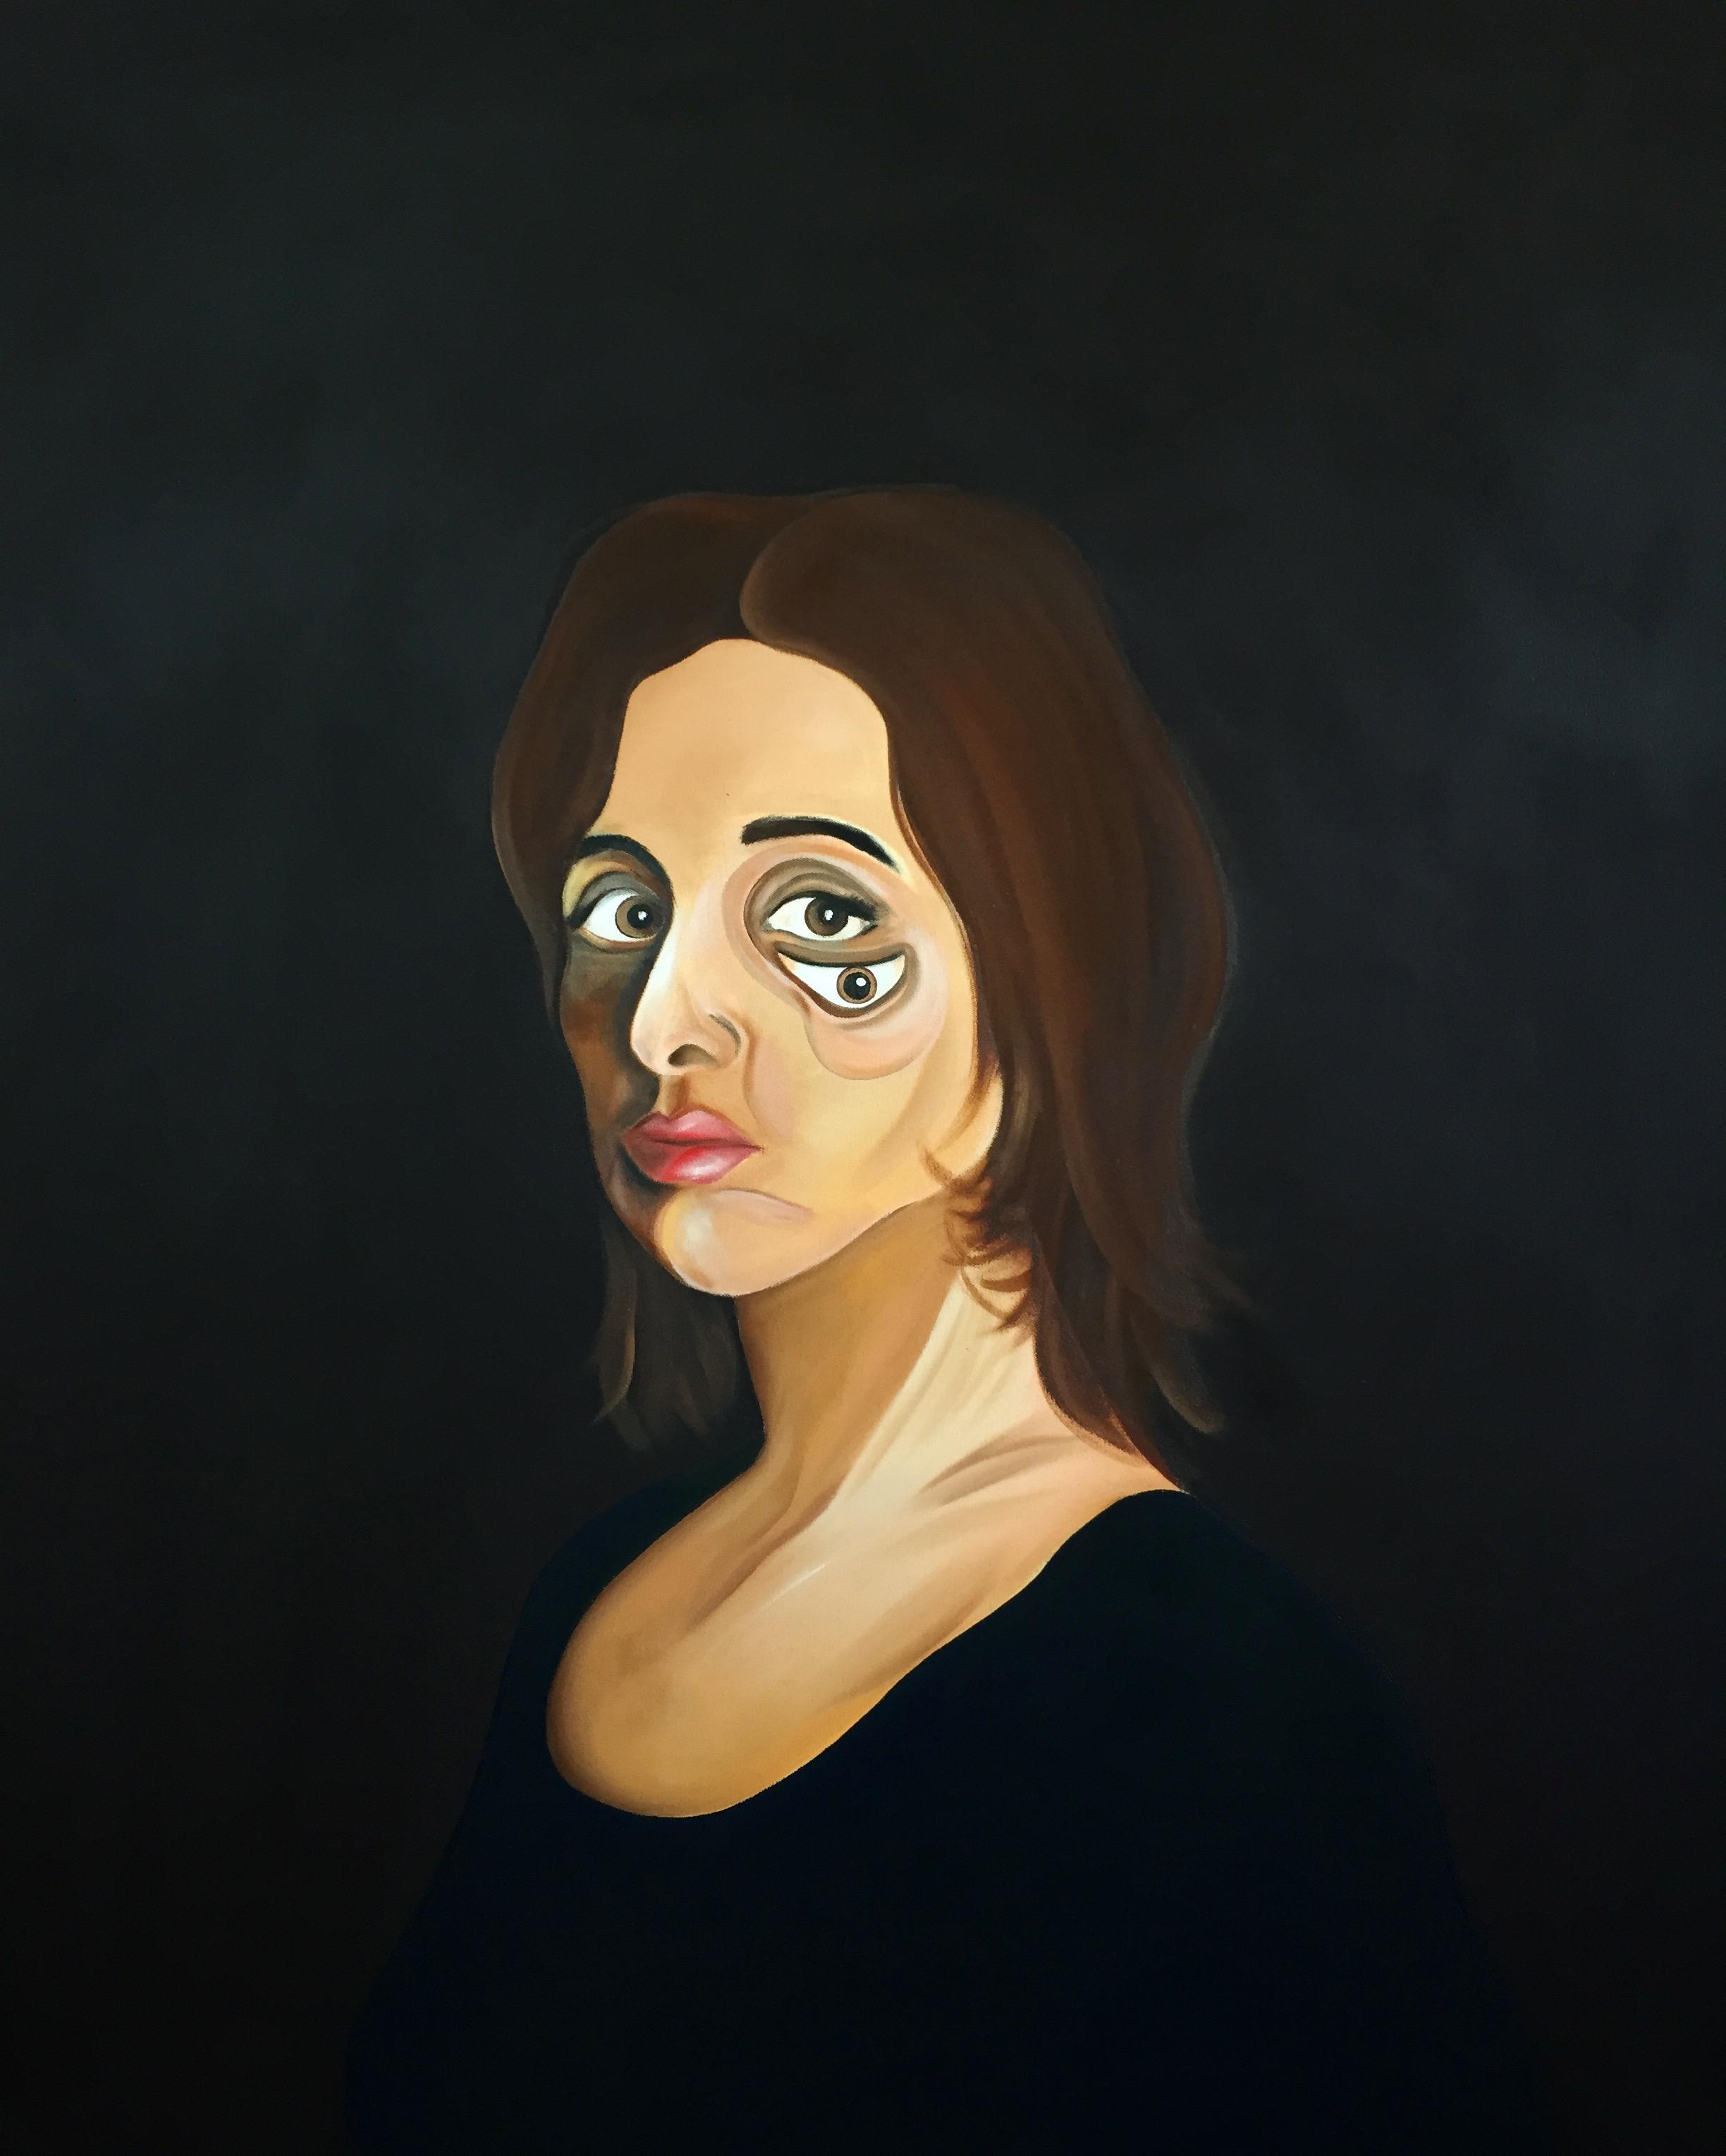 Acrylic on Canvas  48 x 36 in  122 x 91 cm